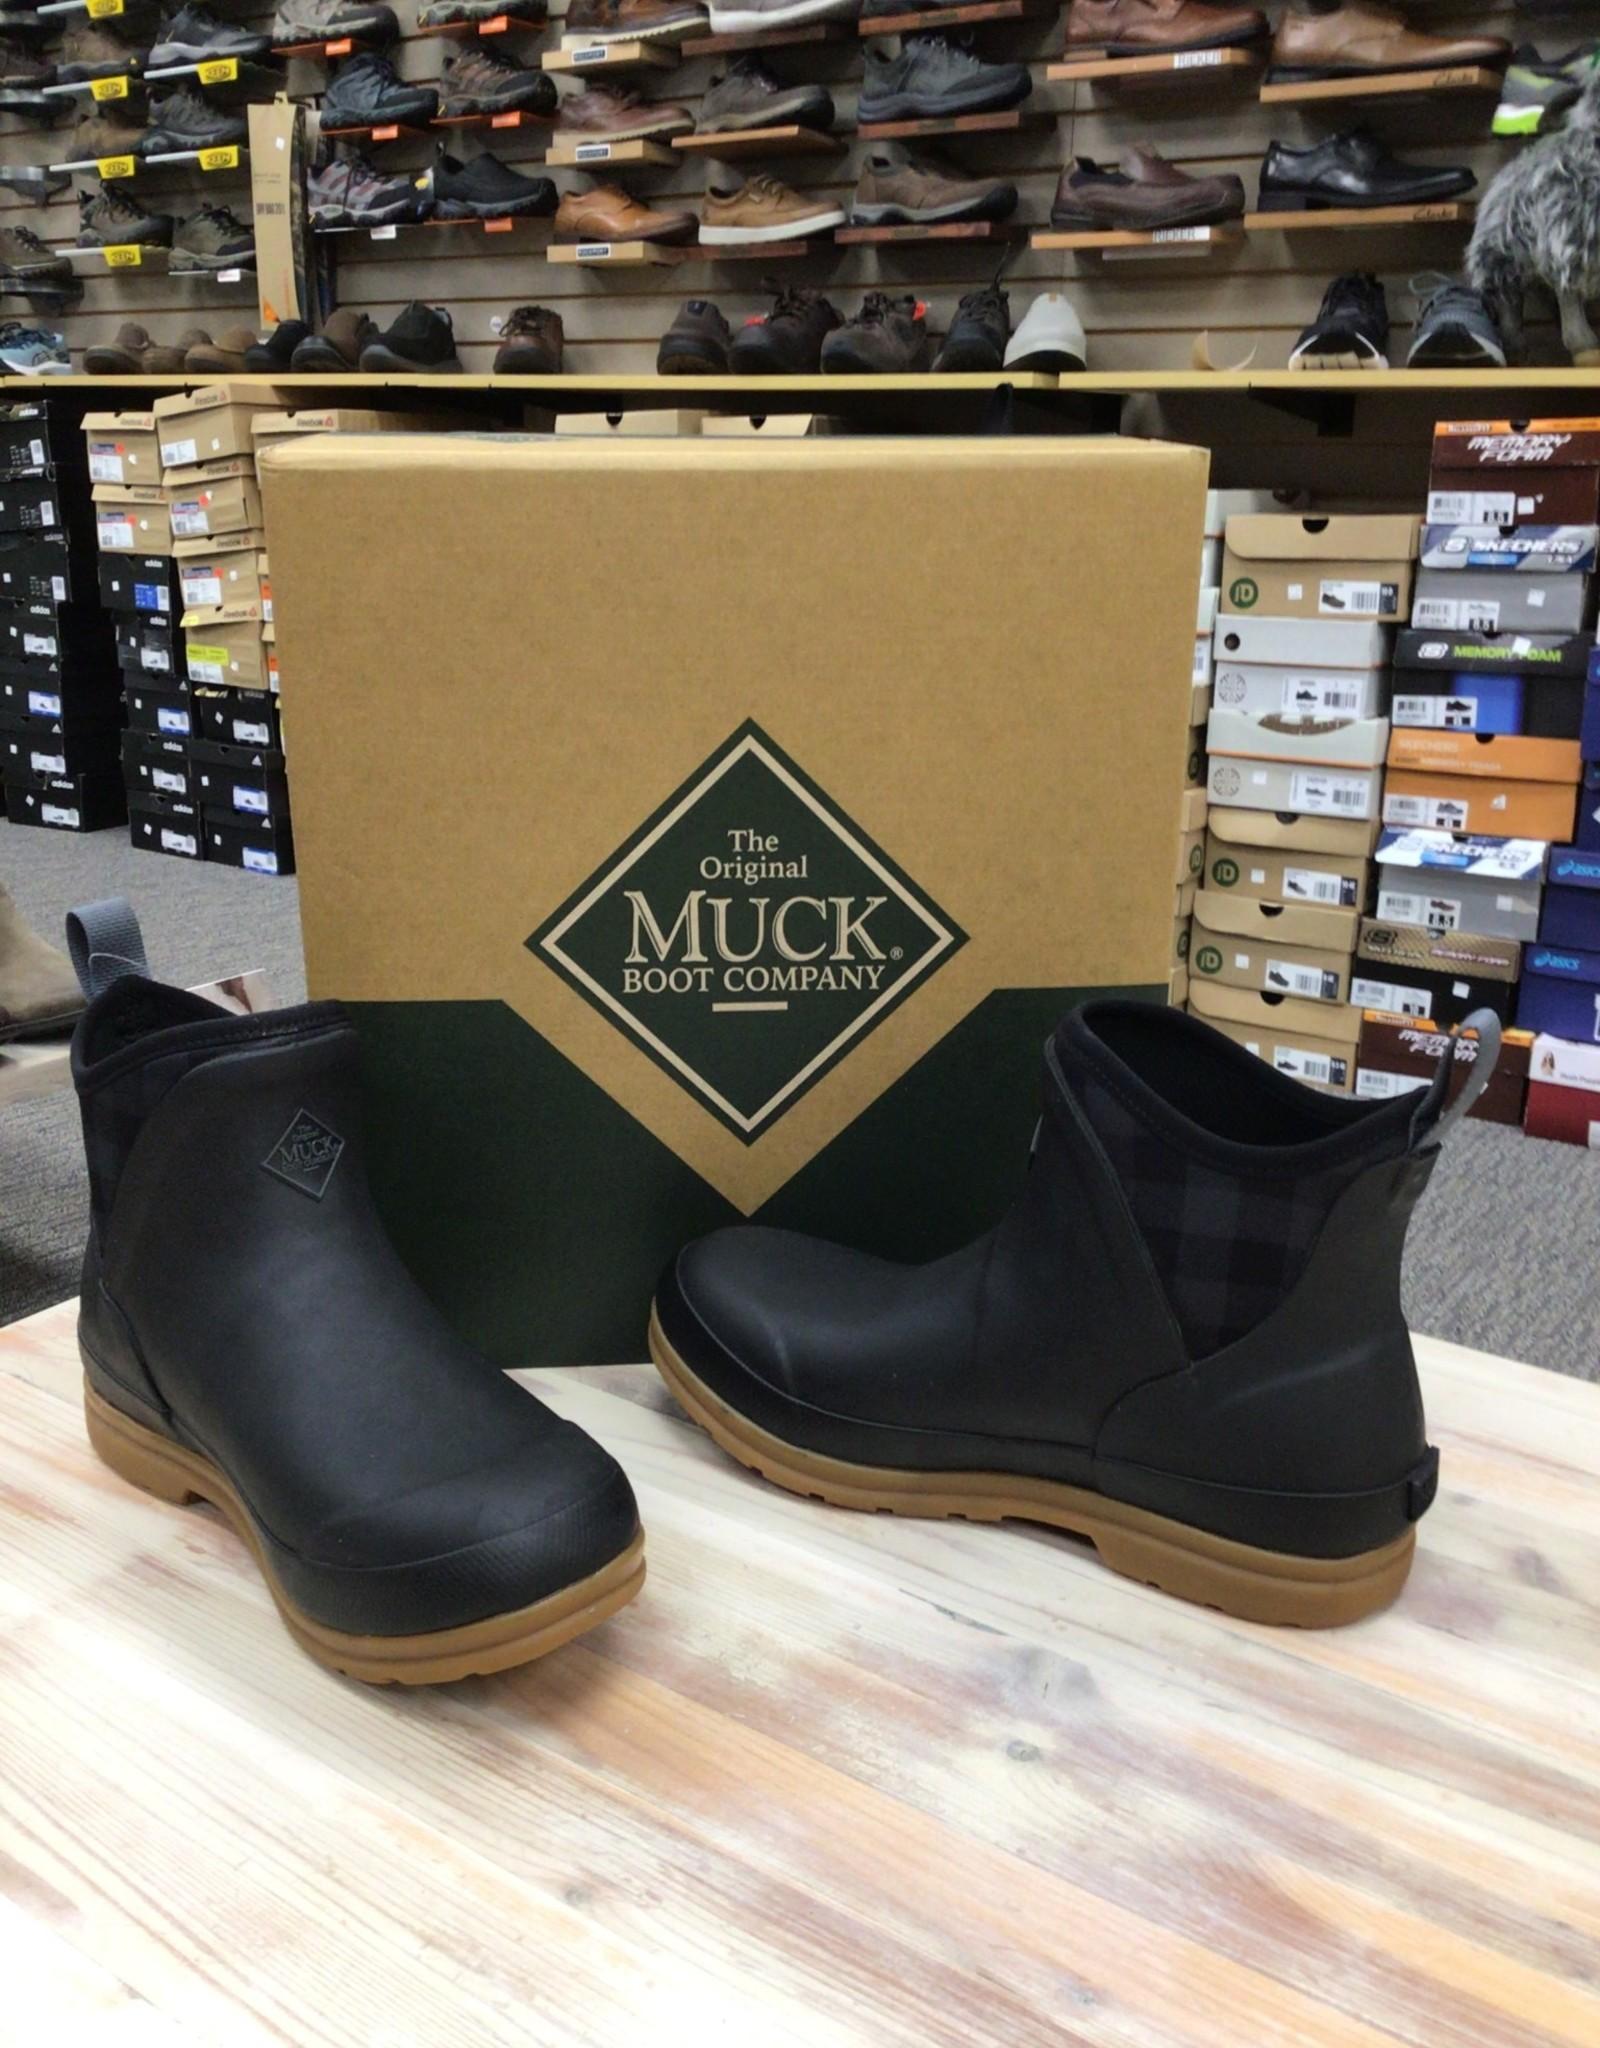 Muck Muck Original Ankle OAW-1 Plaid Ladies'